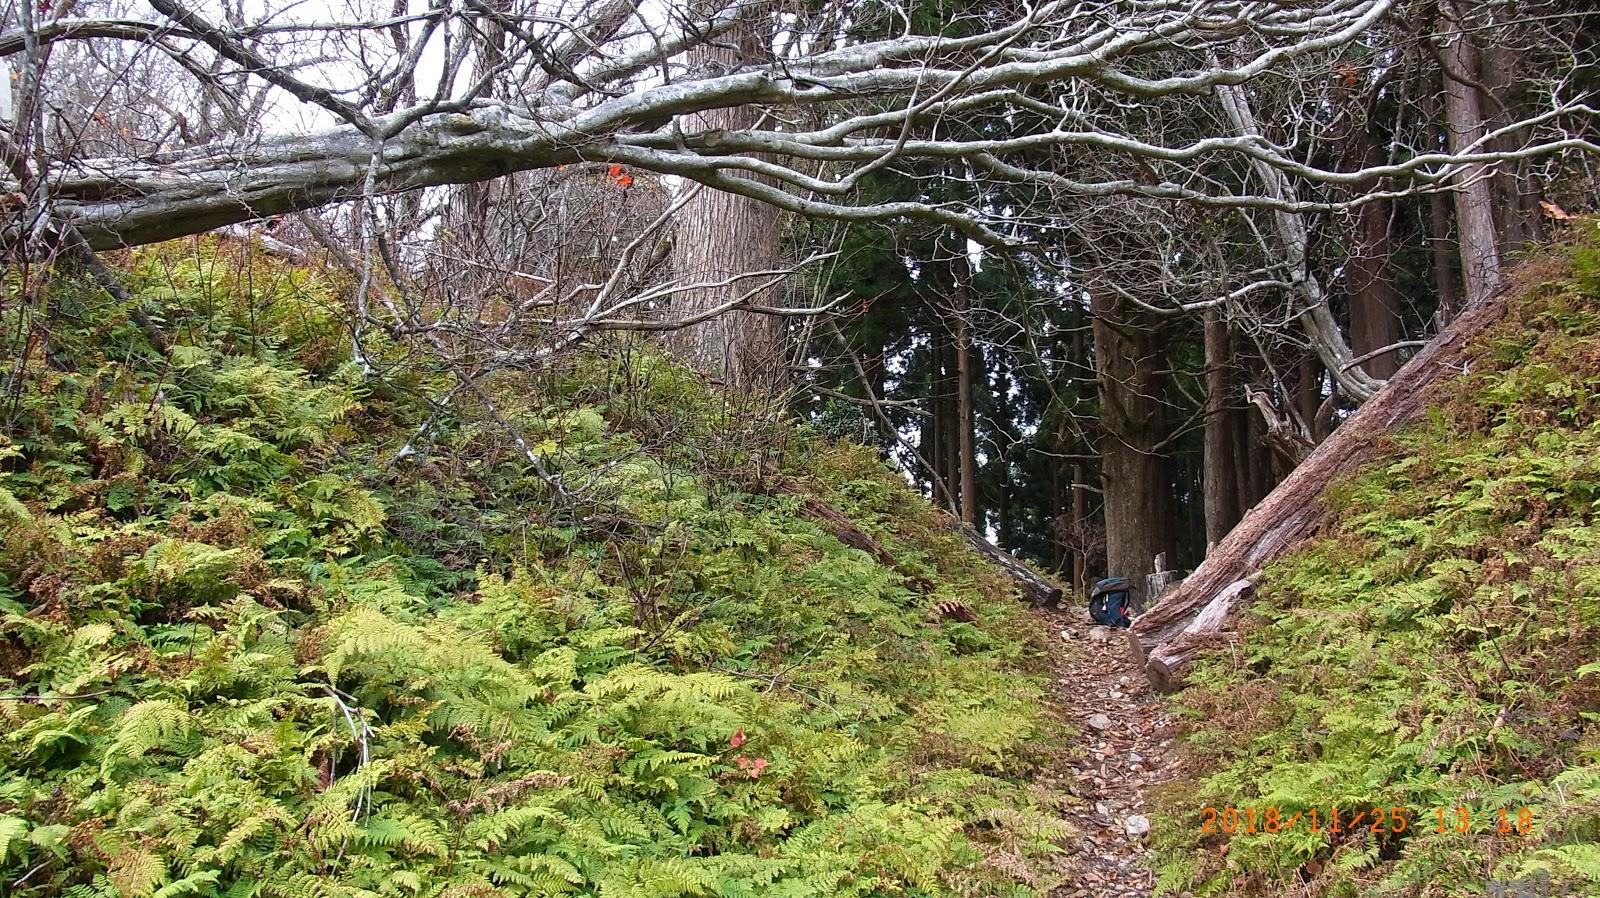 dokodoko-walkin'2: 【北山詣16】尾桟敷から祖父谷峠越えで井戸